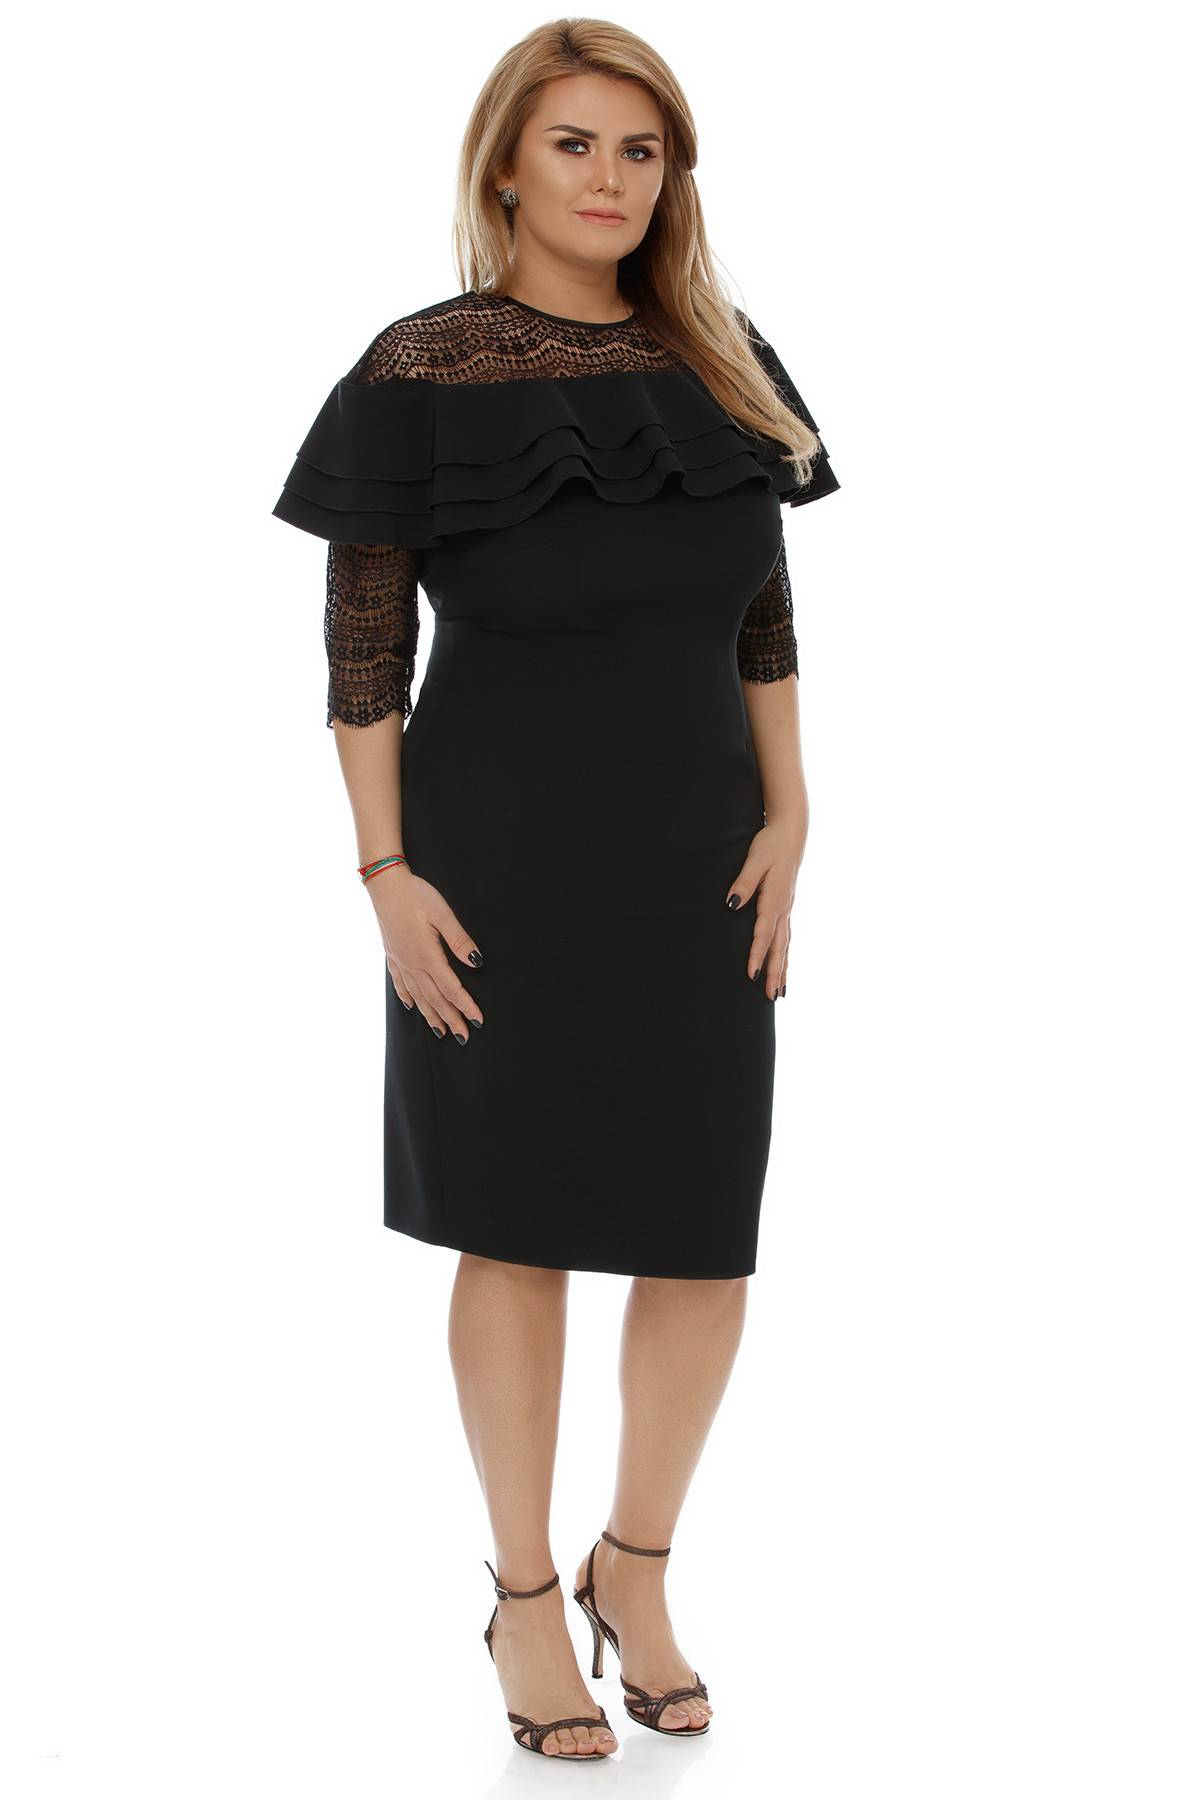 Rochie Plus Size Angeline Neagră